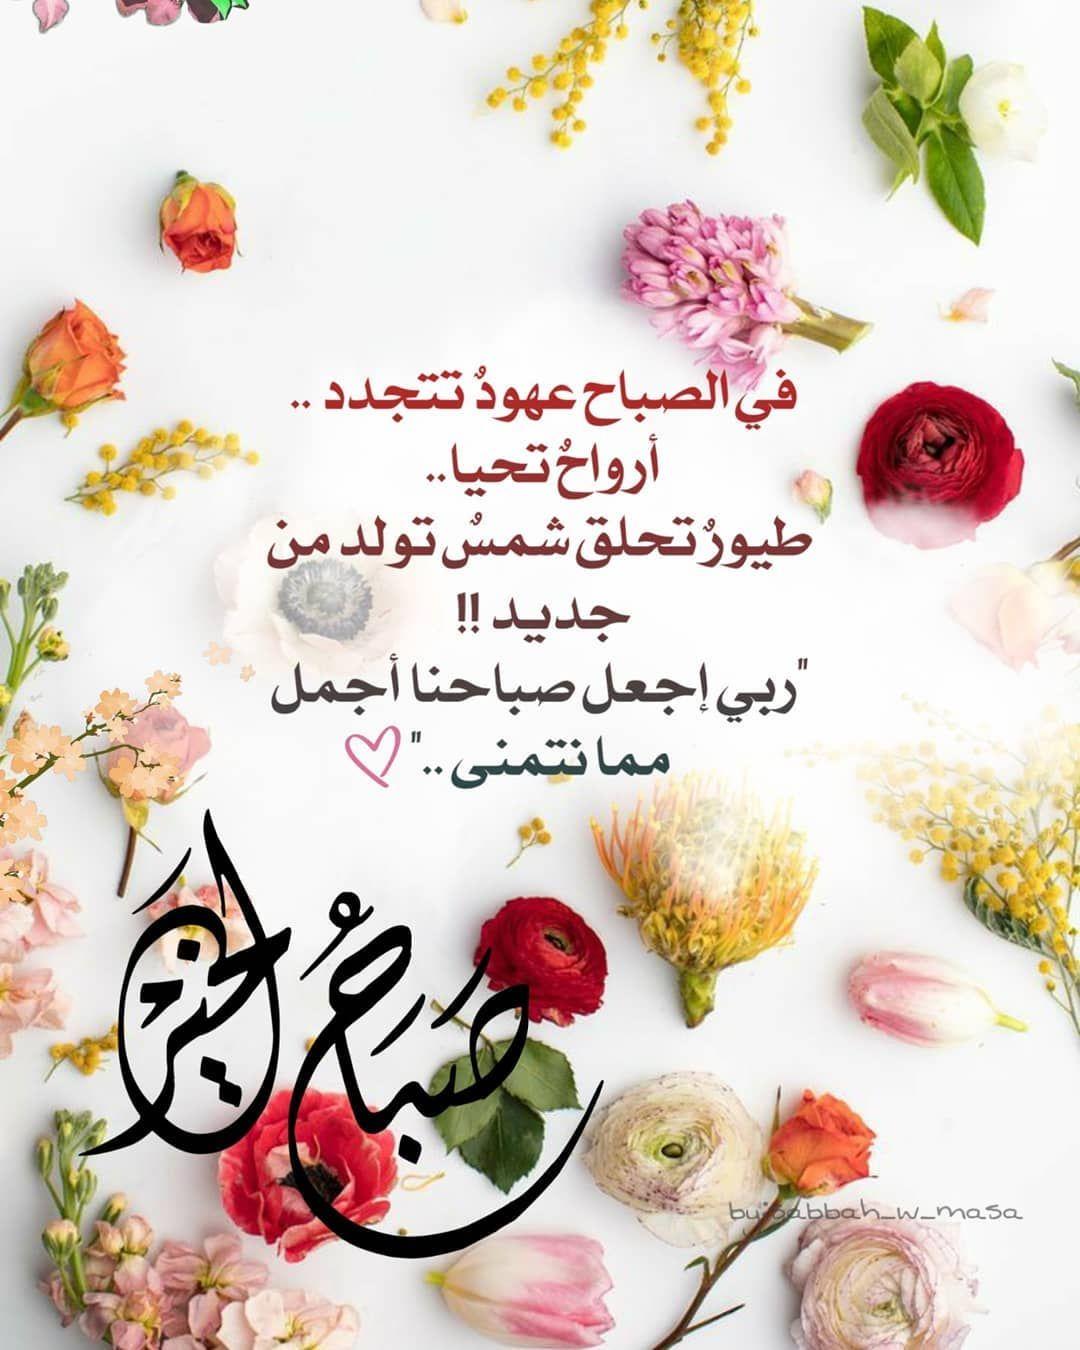 صبح و مساء On Instagram ص با ح الخي رآت و الم س ر ات عشر ذي ال Good Morning Flowers Good Morning Quotes Funny Photo Memes